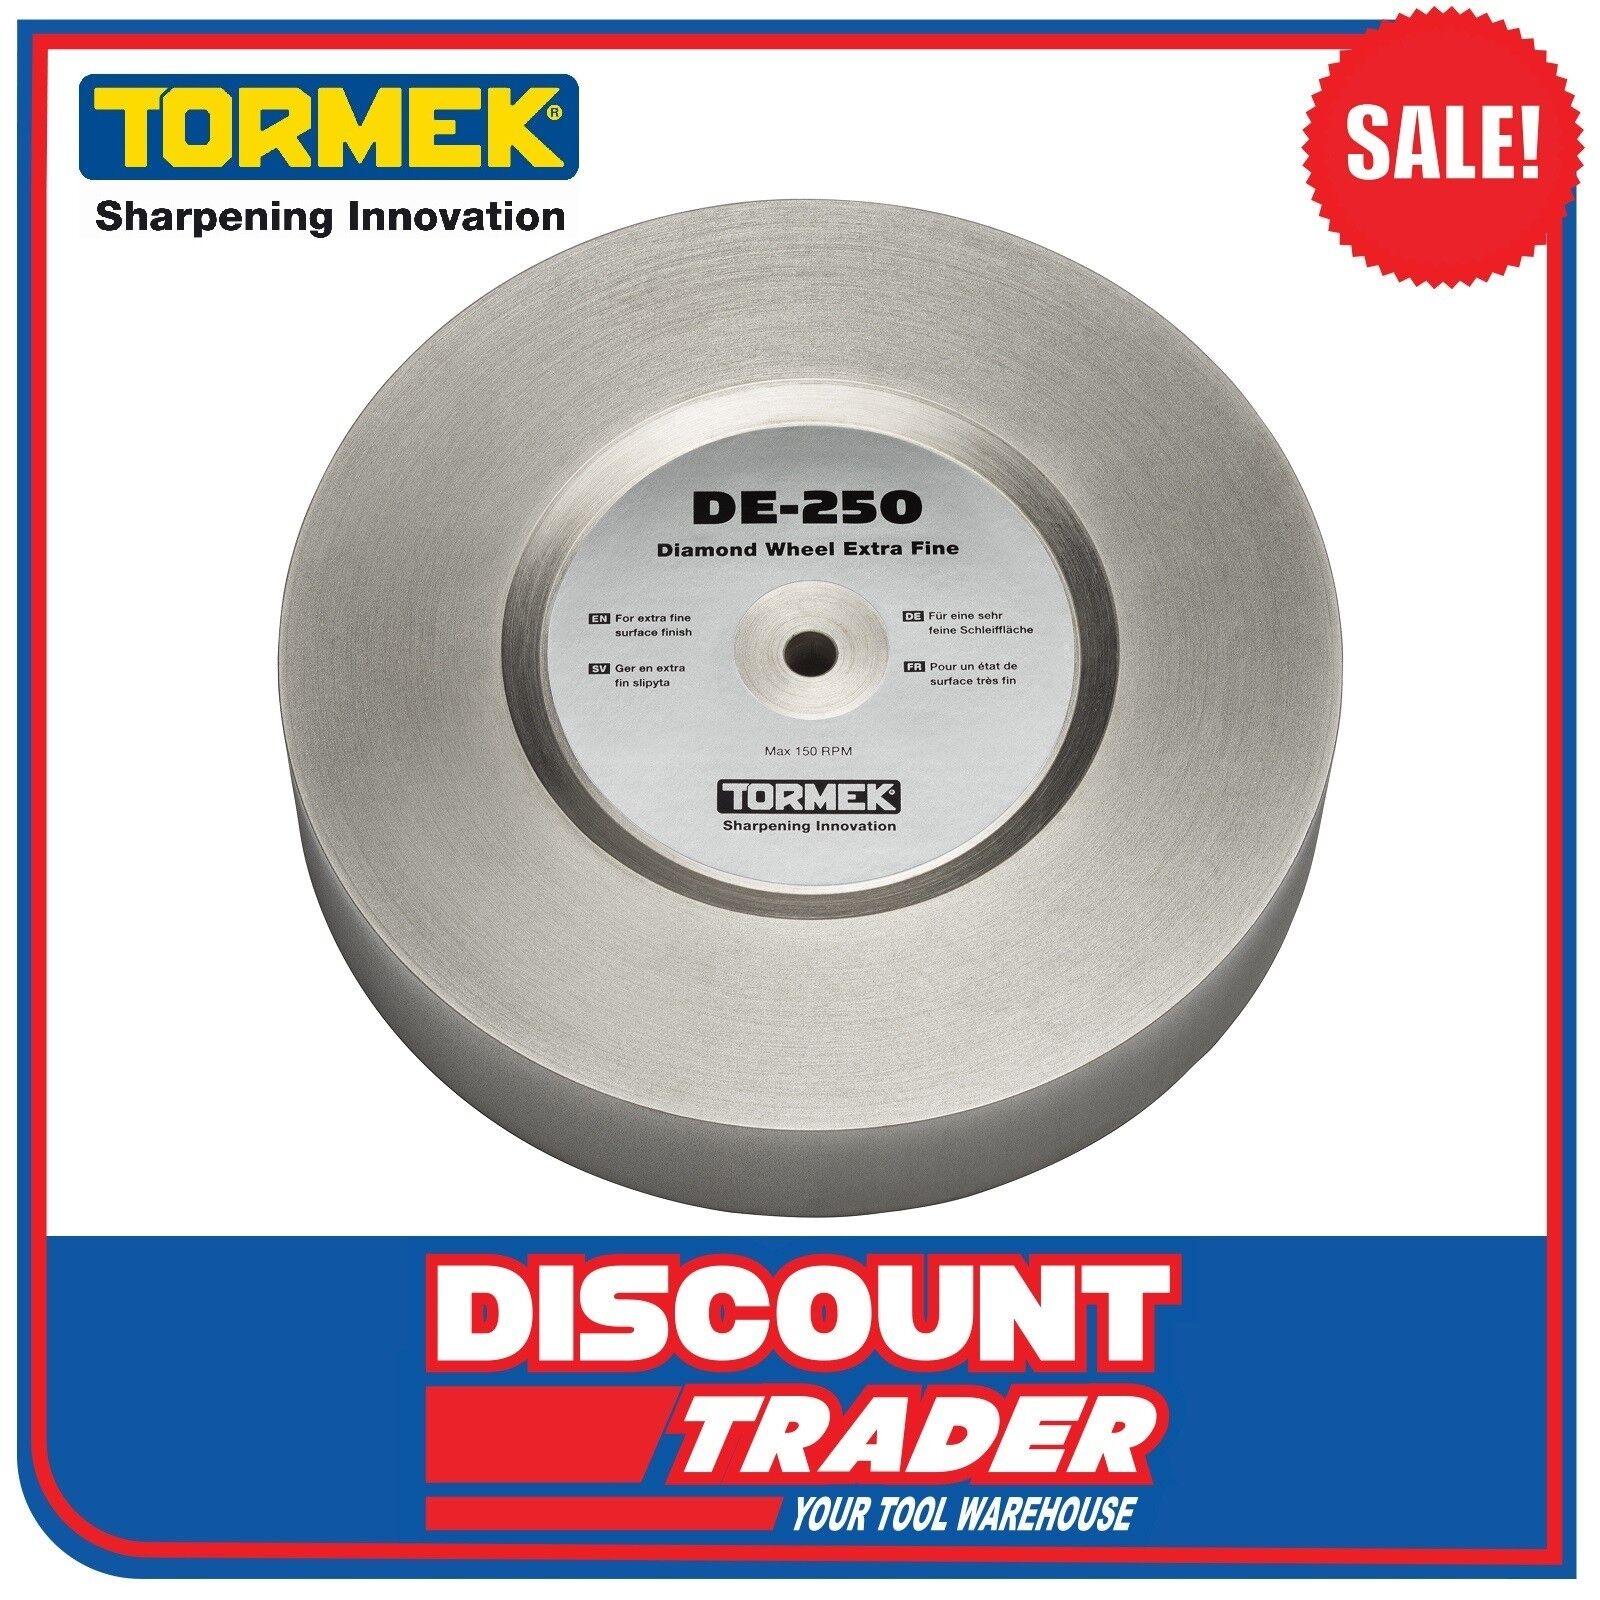 Tormek 1200 Grit Extra Fine Diamond Wheel DE-250 for T-8 and T-7